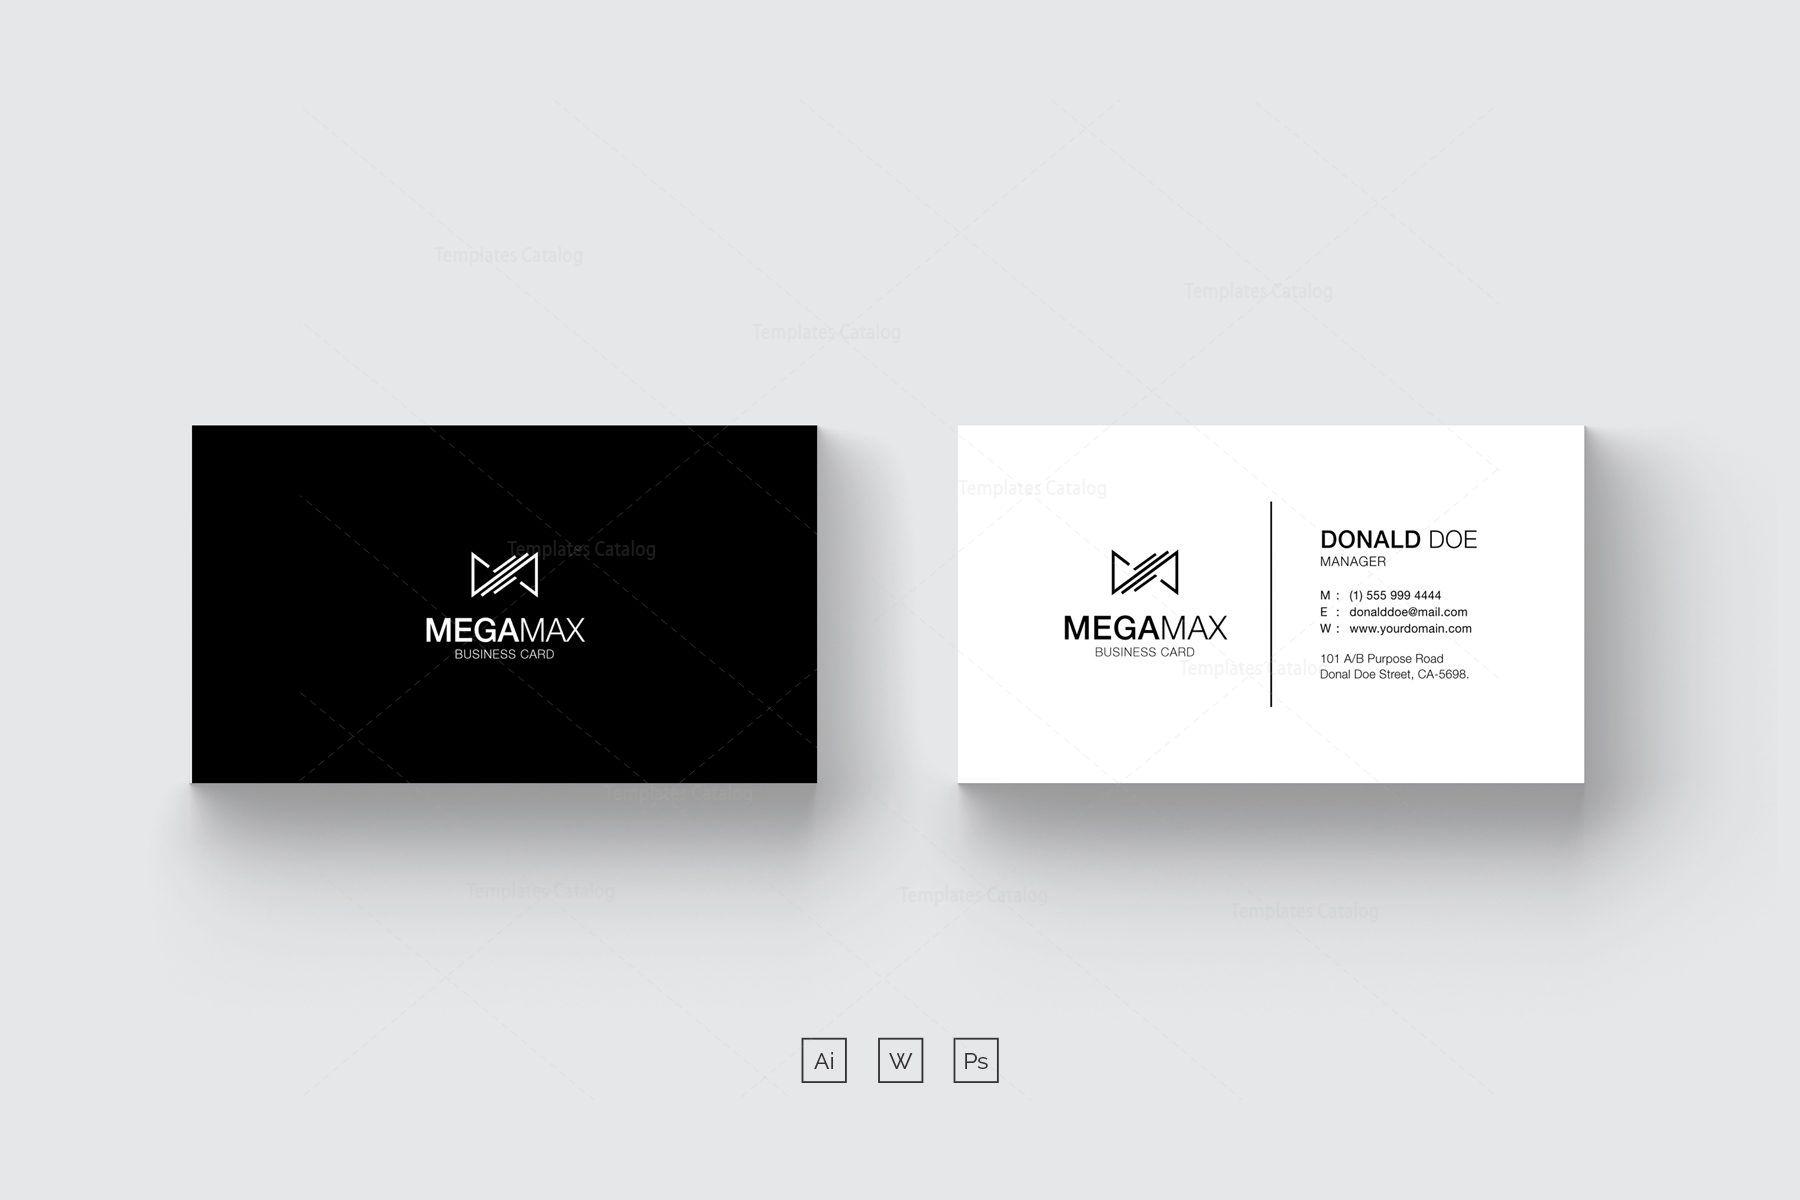 Minimal Black White Business Card Design 002424 Template Catalog White Business Card Design Free Business Card Templates White Business Card